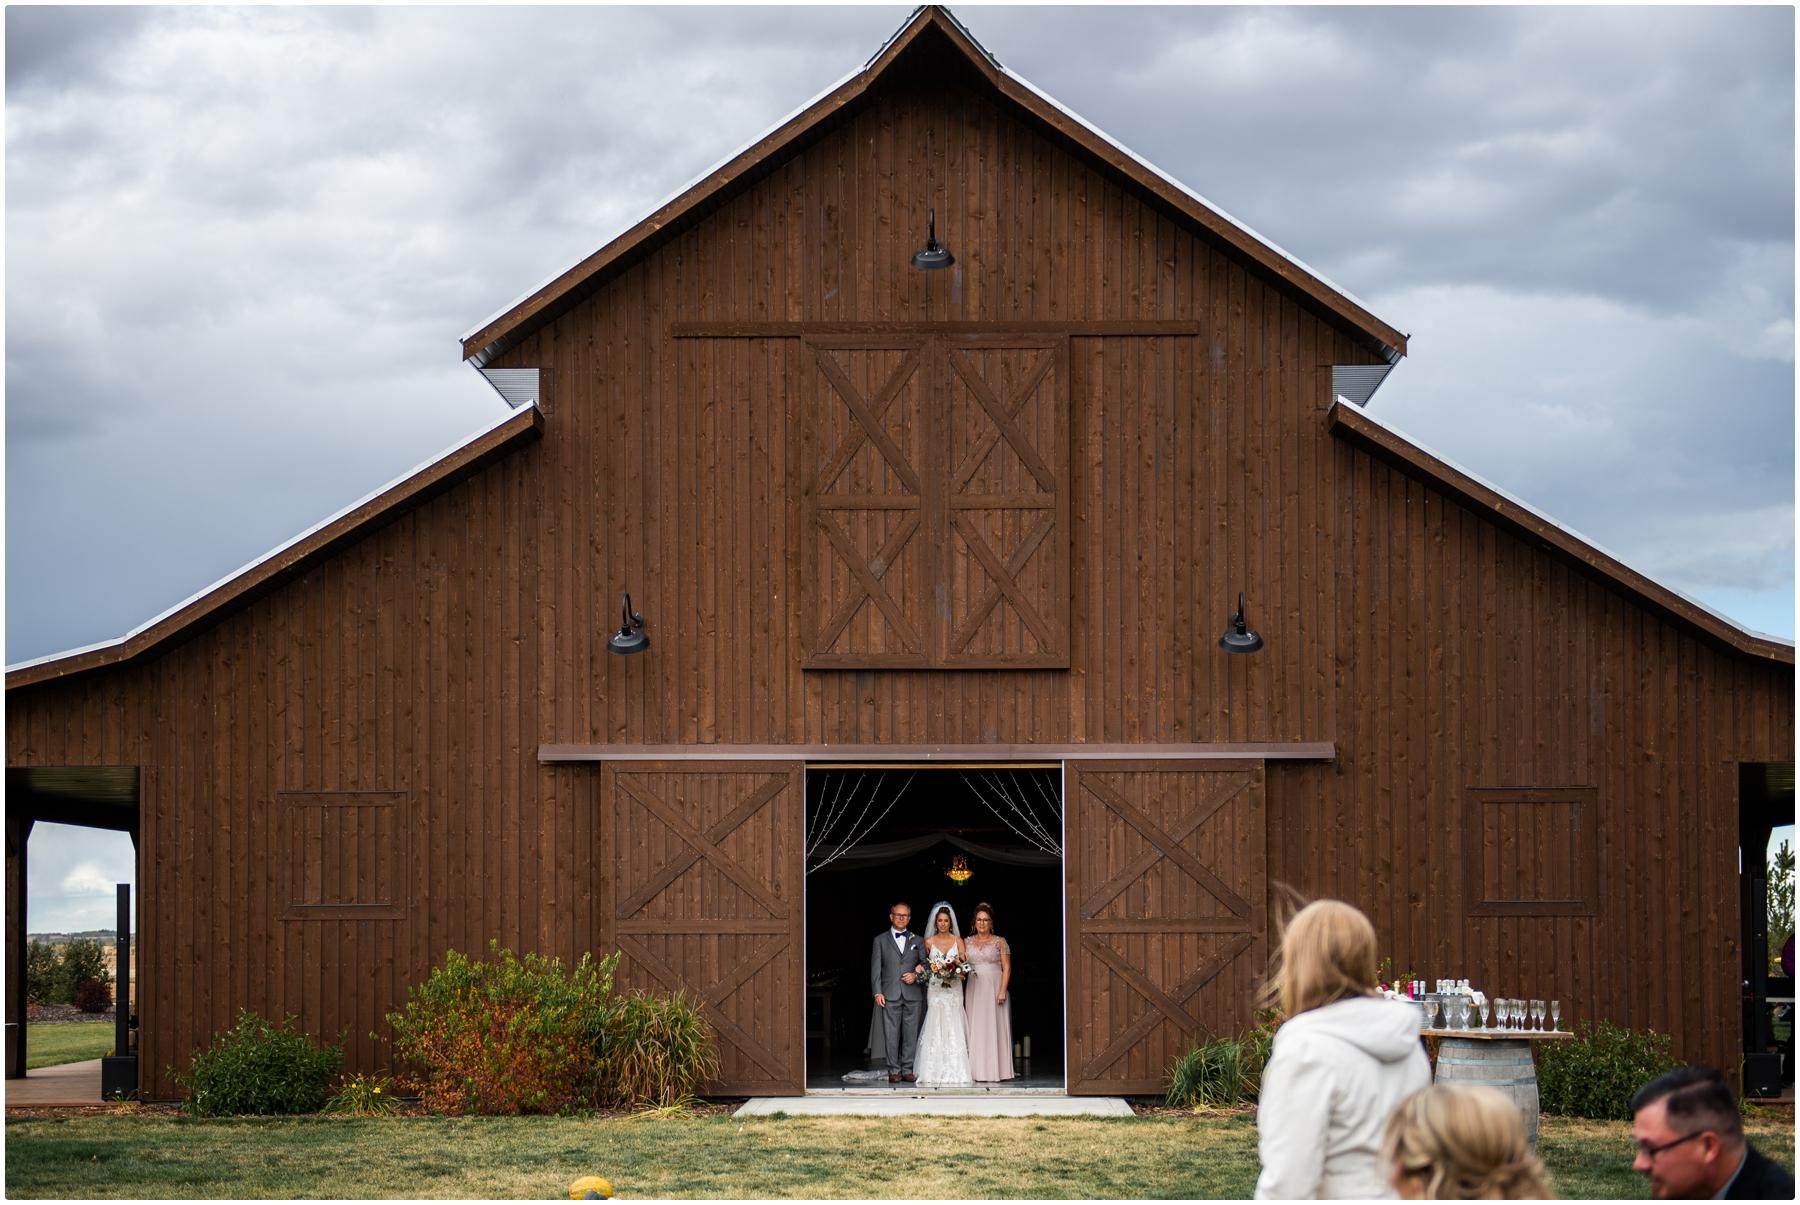 Sweet Haven Barn Wedding Ceremony Photography - Fall Outdoor Wedding